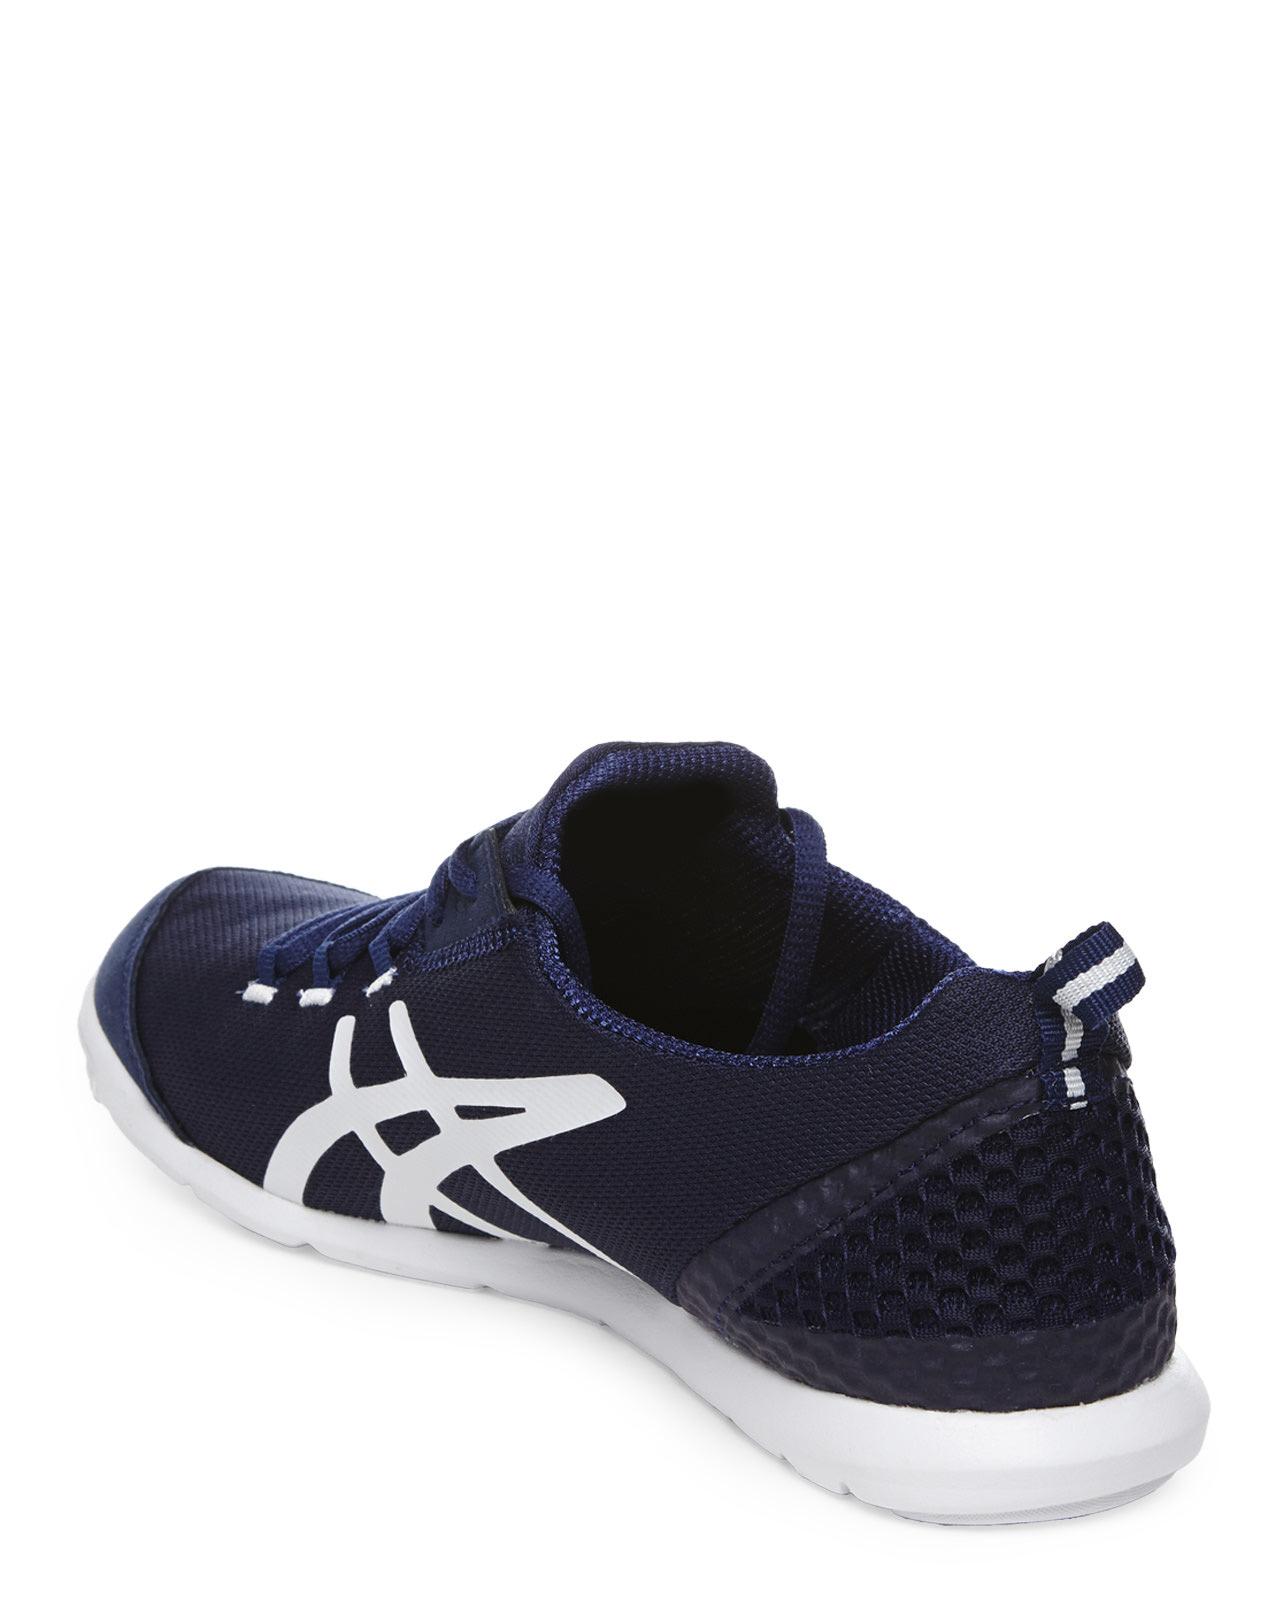 9cb17954dadb Lyst - Asics Navy   White Metrolyte Sneakers in Blue